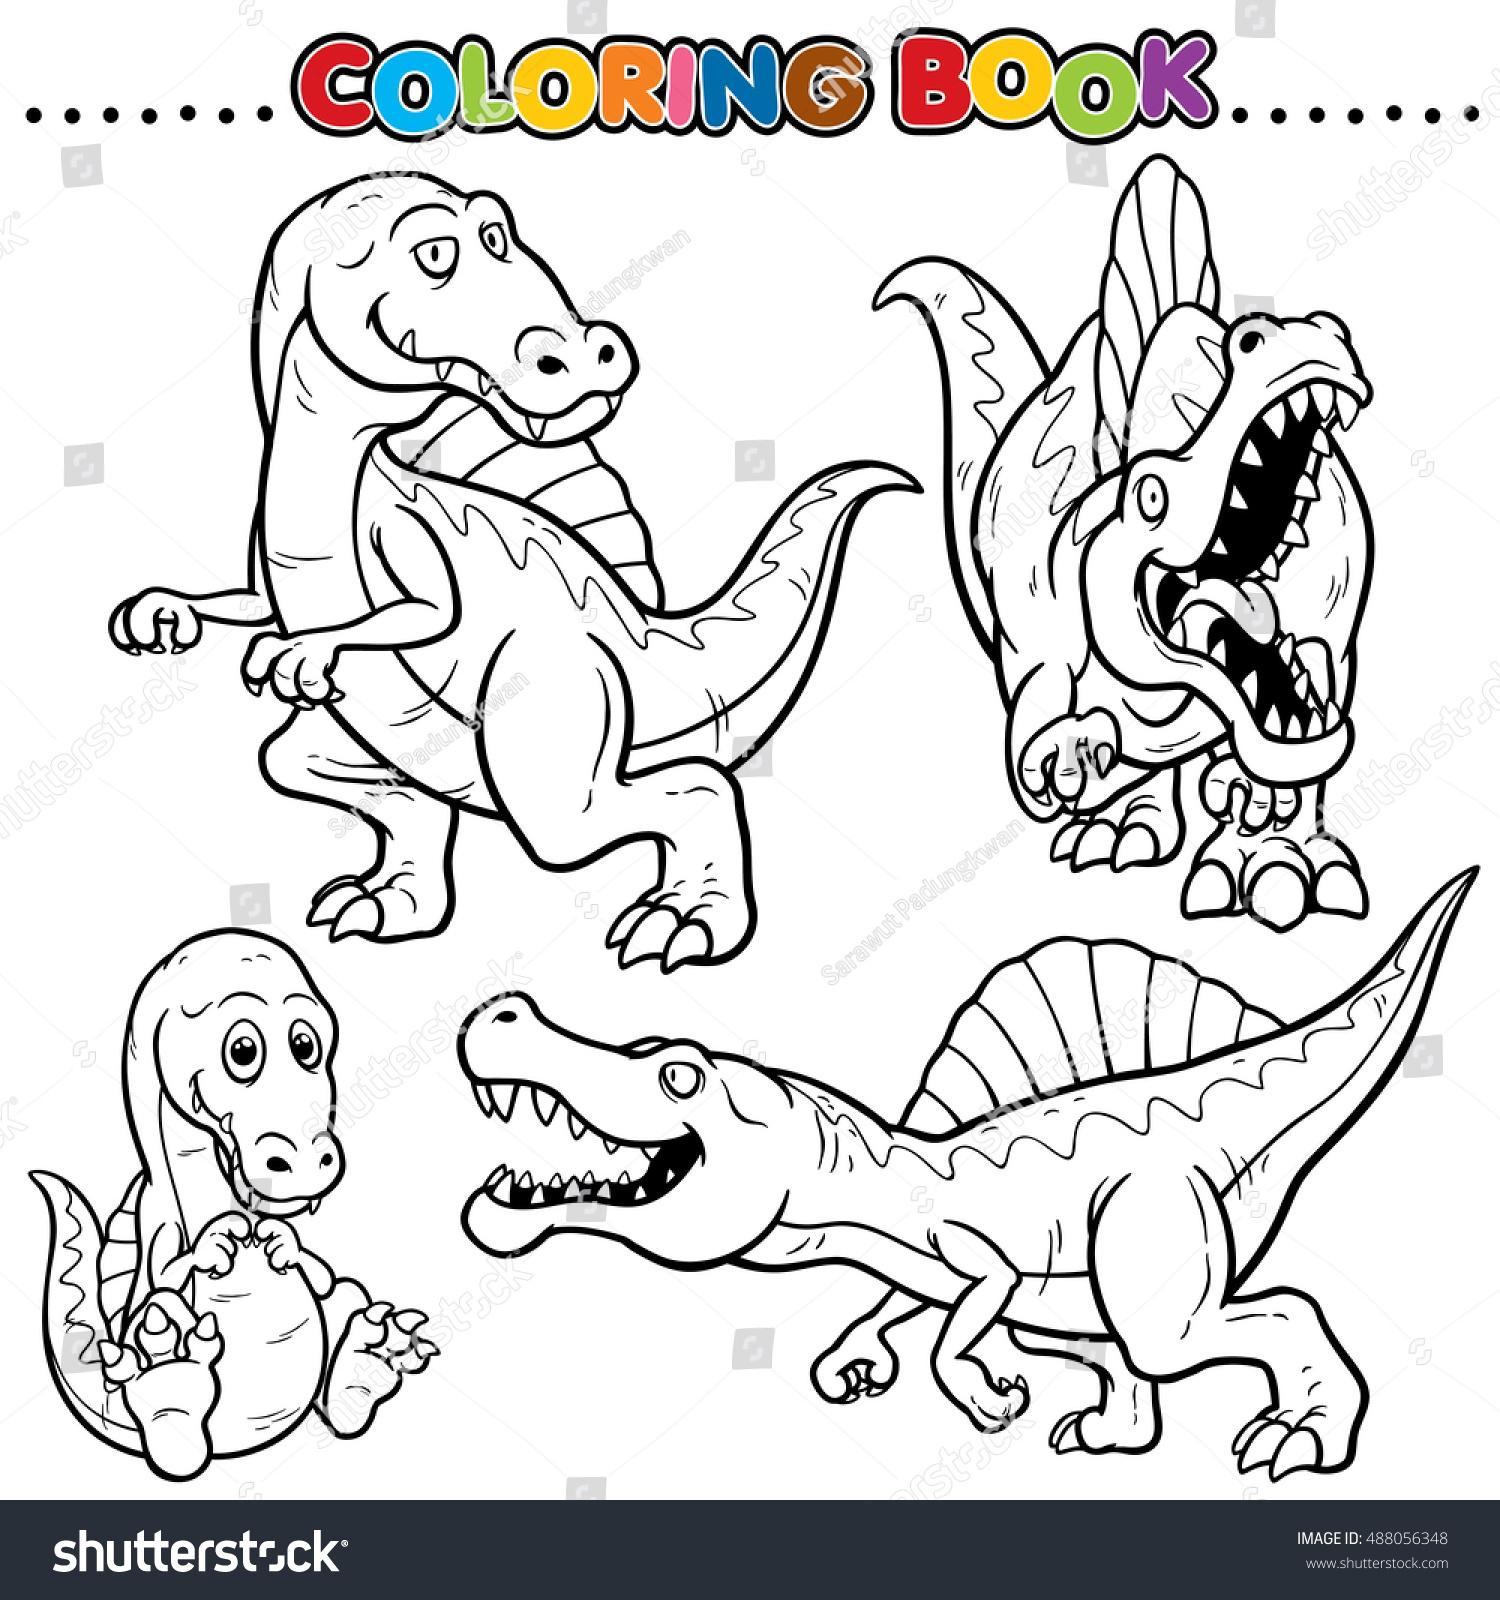 Cartoon Coloring Book Dinosaurs Character Stock Vector 488056348